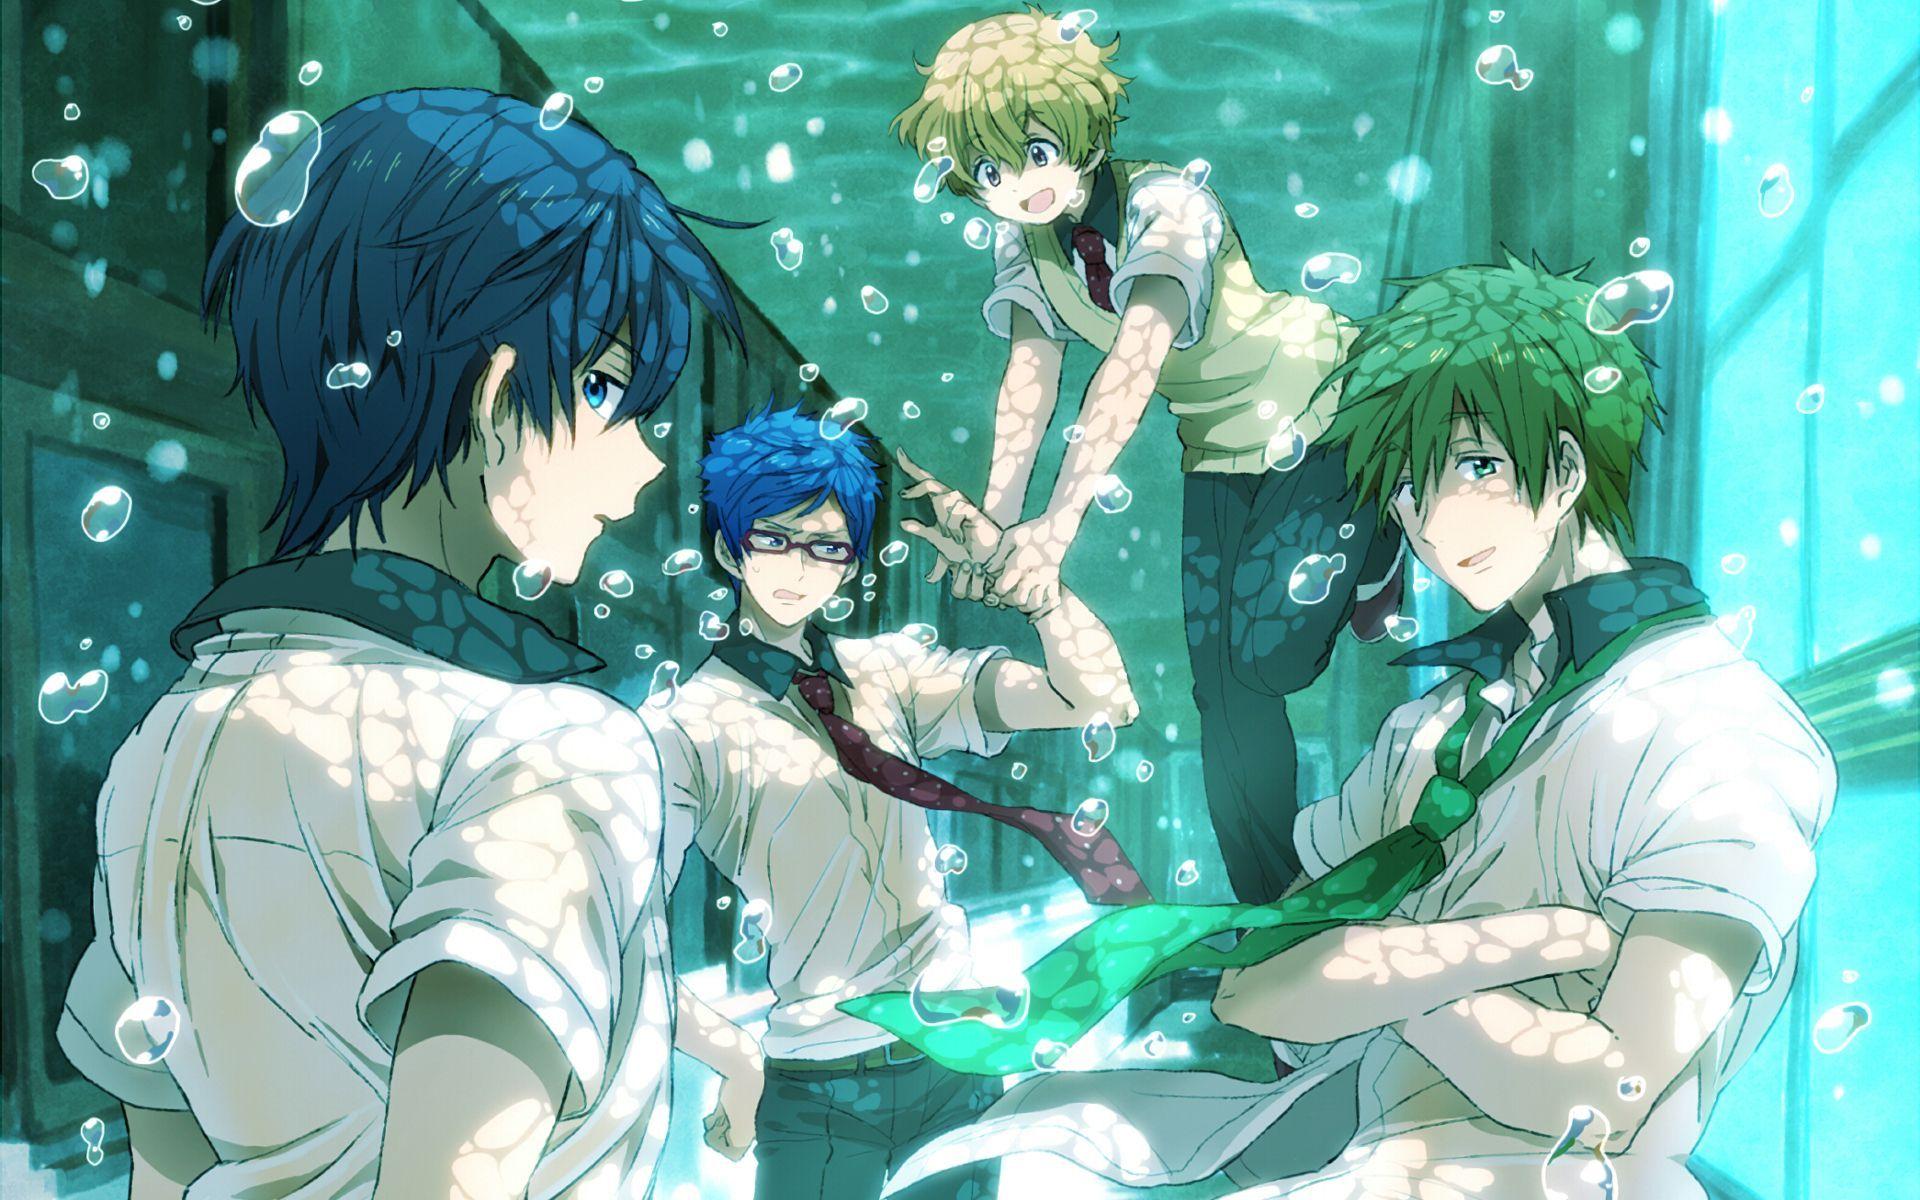 Tapety Anime In 2021 Anime Free Anime Anime Wallpaper Live Anime free wallpaper hd